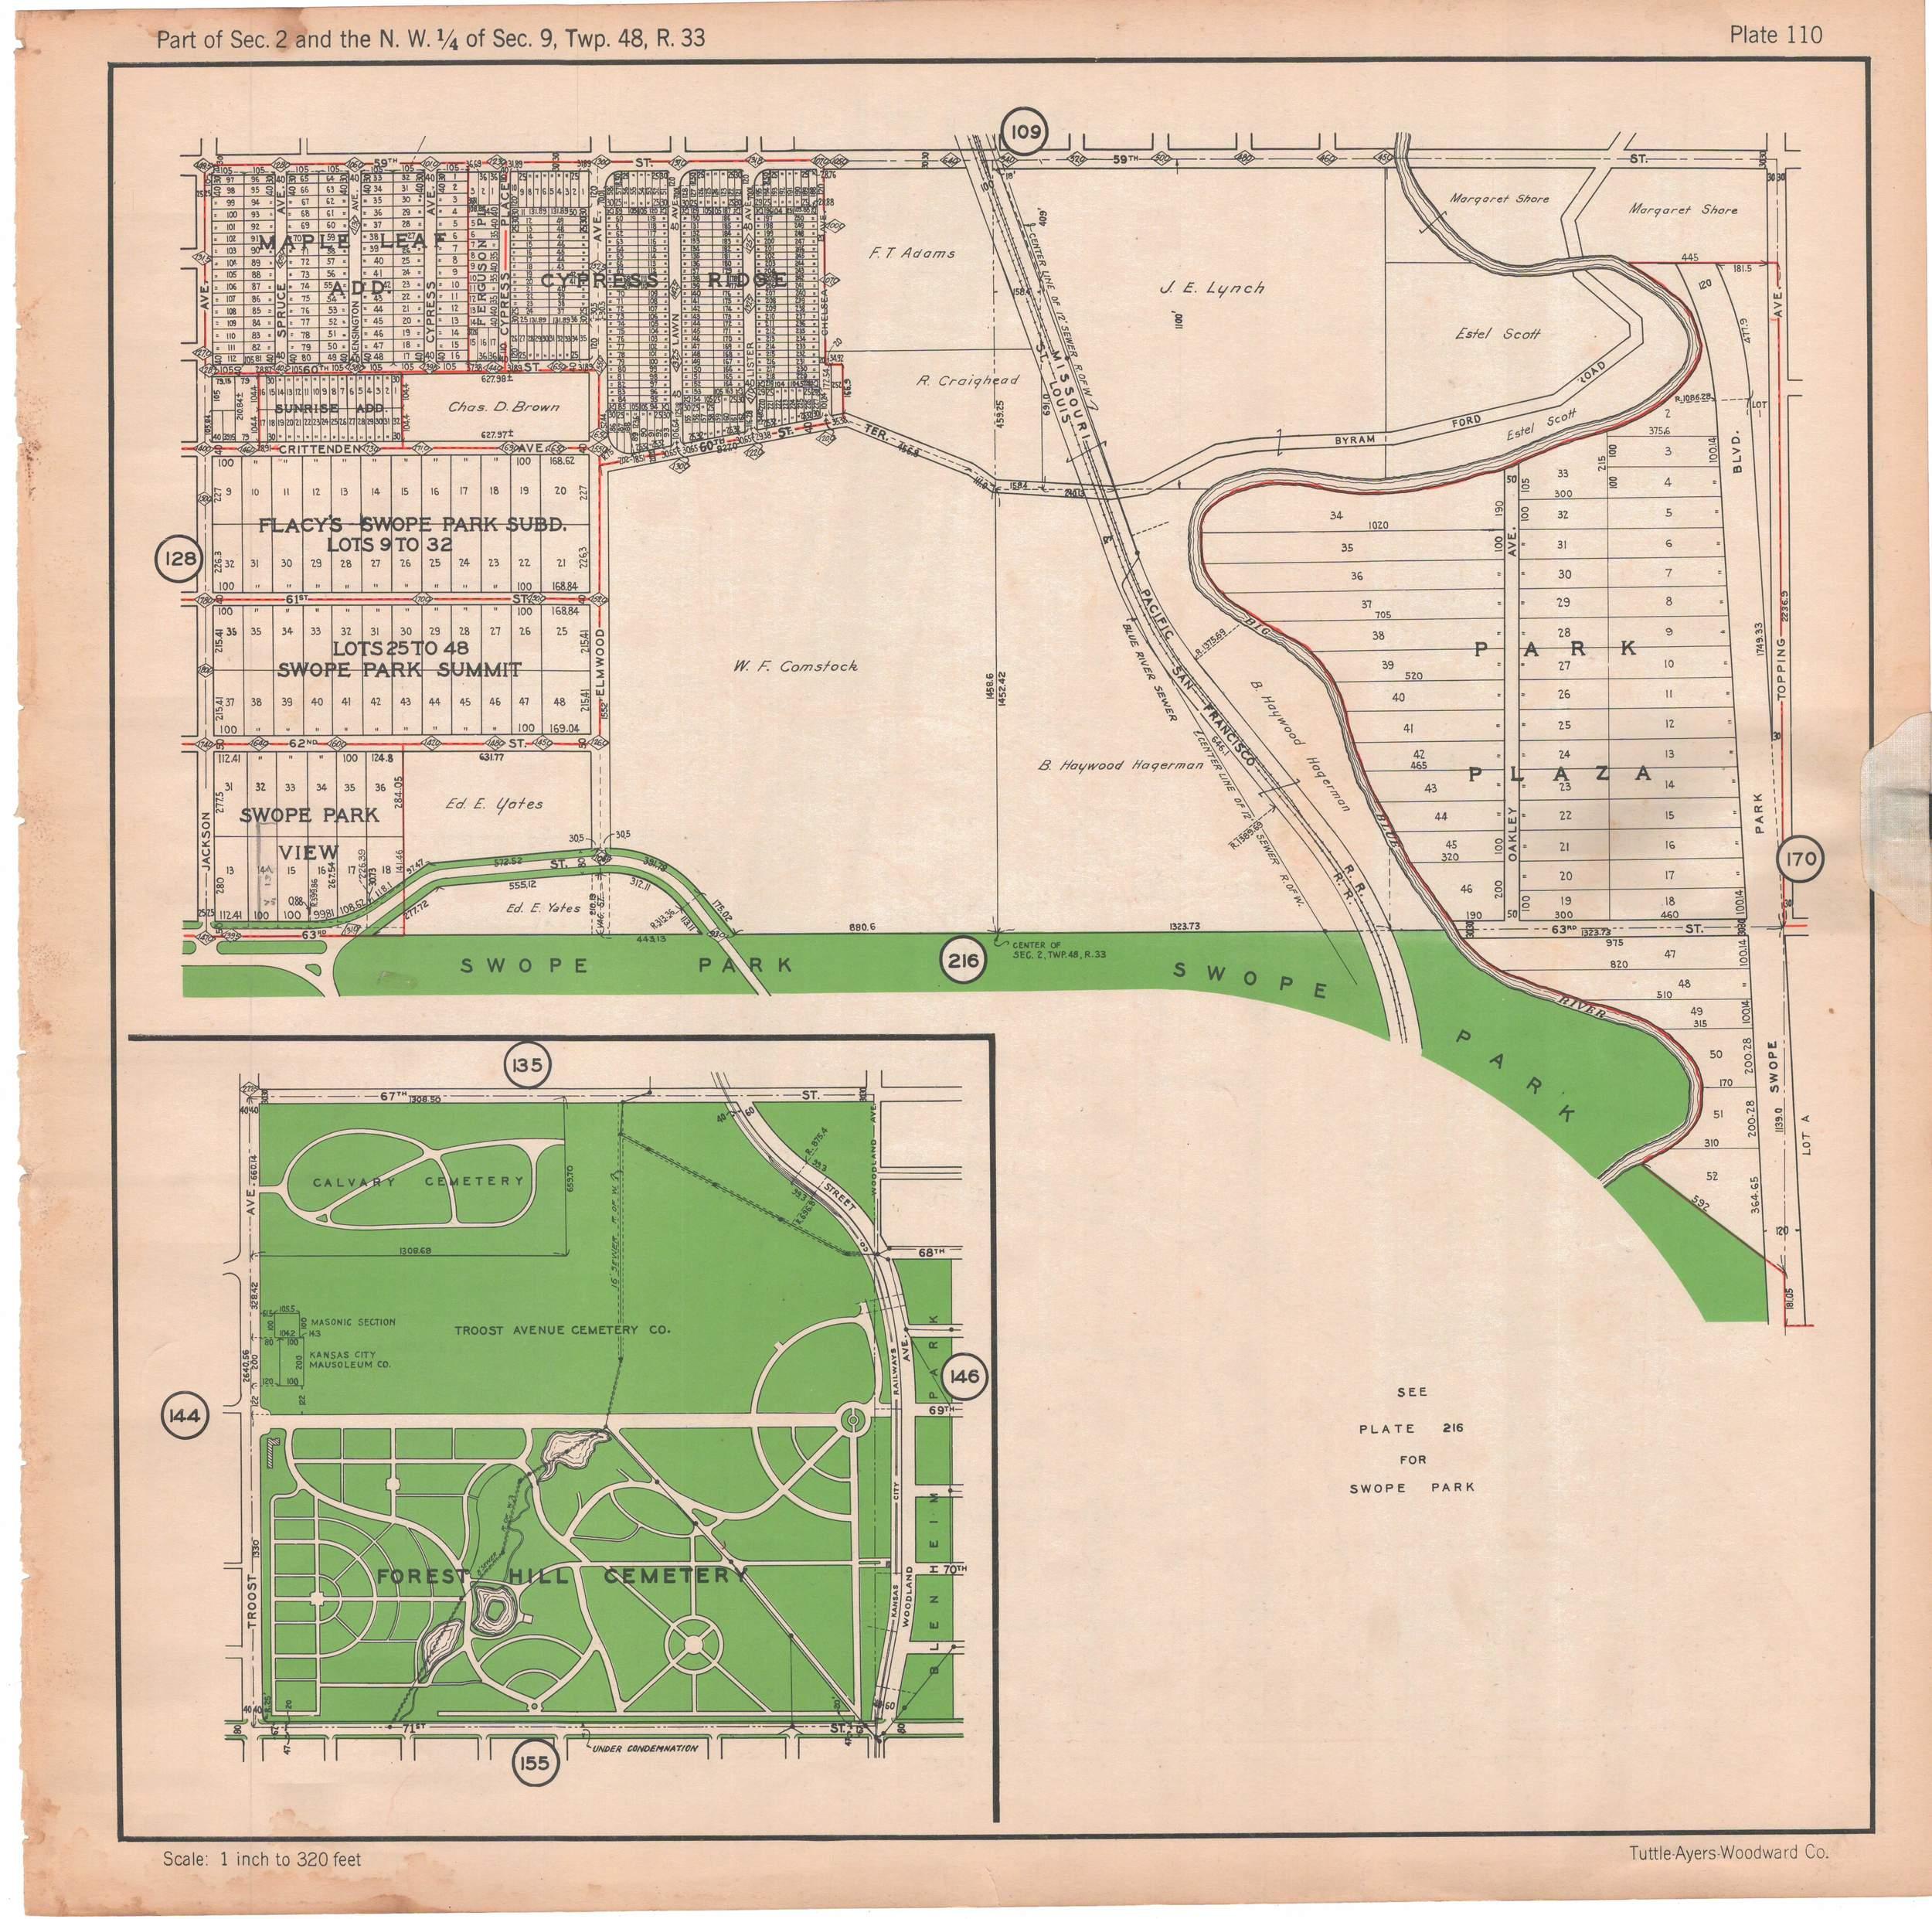 1925 TUTTLE_AYERS_Plate 110.JPG